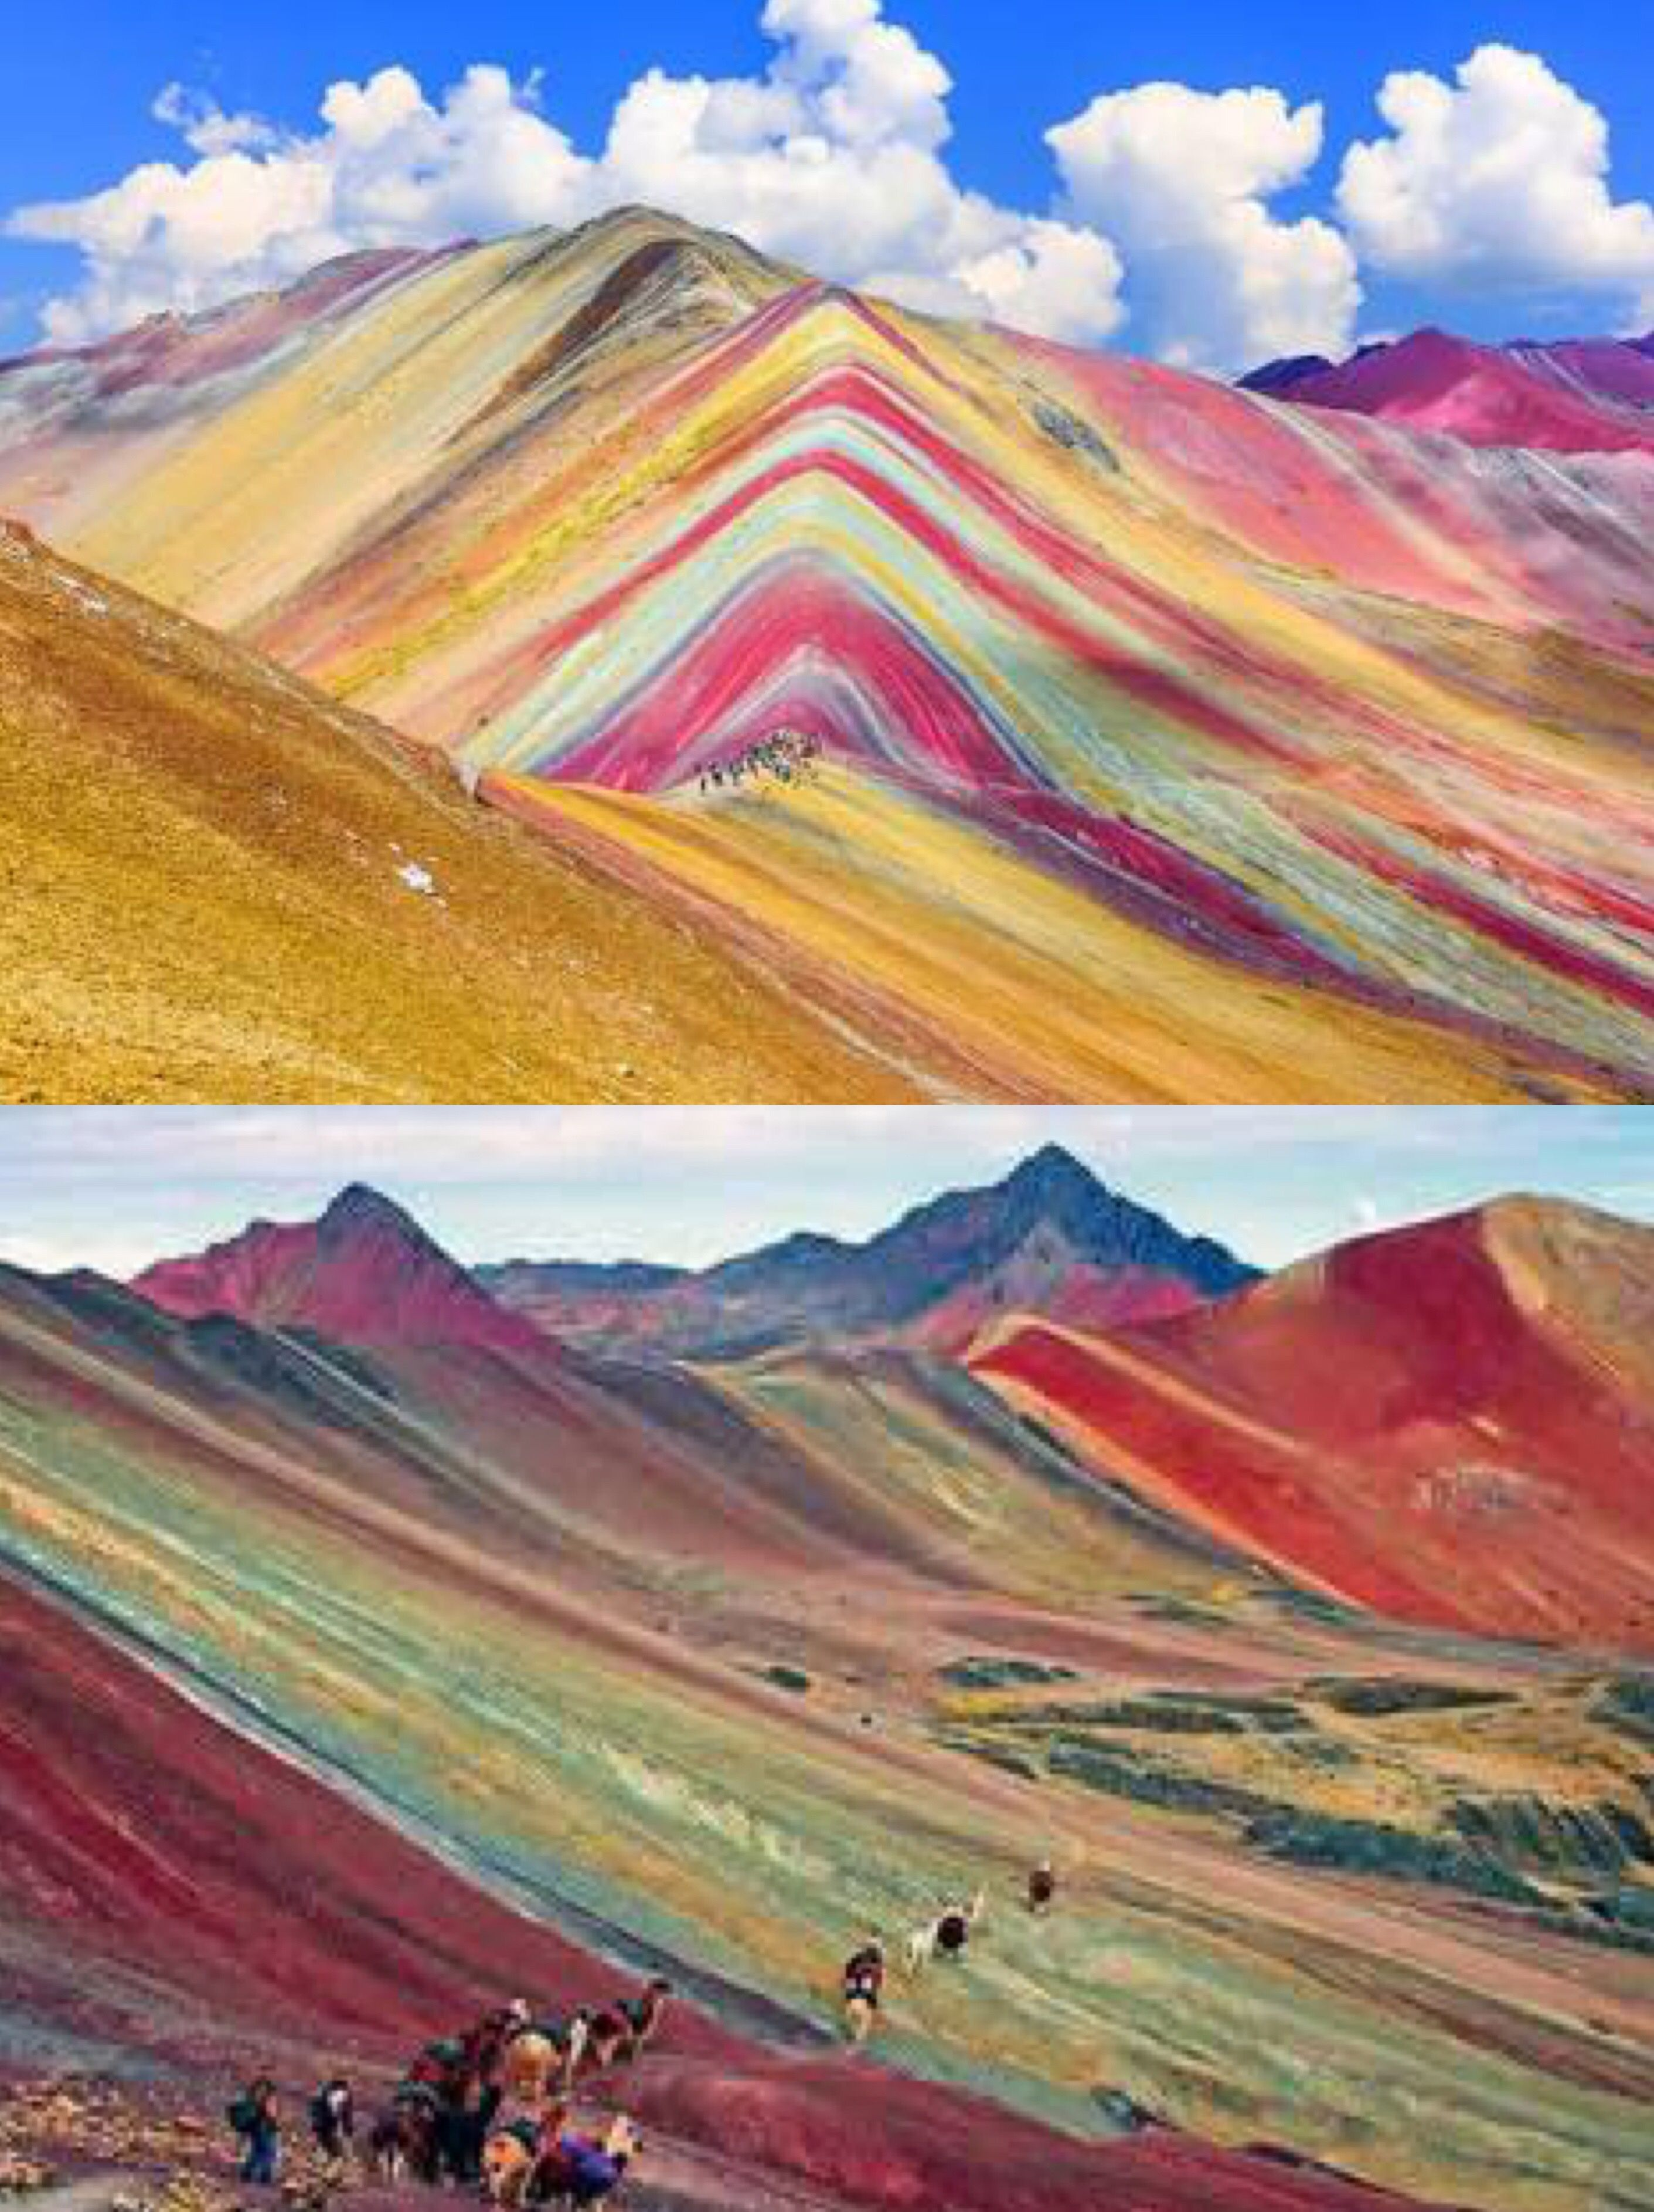 9a4ee0a88 Vinicunca Rainbow Mountain,Peru Peru Travel, South America Travel, Rainbow  Mountains, Cusco